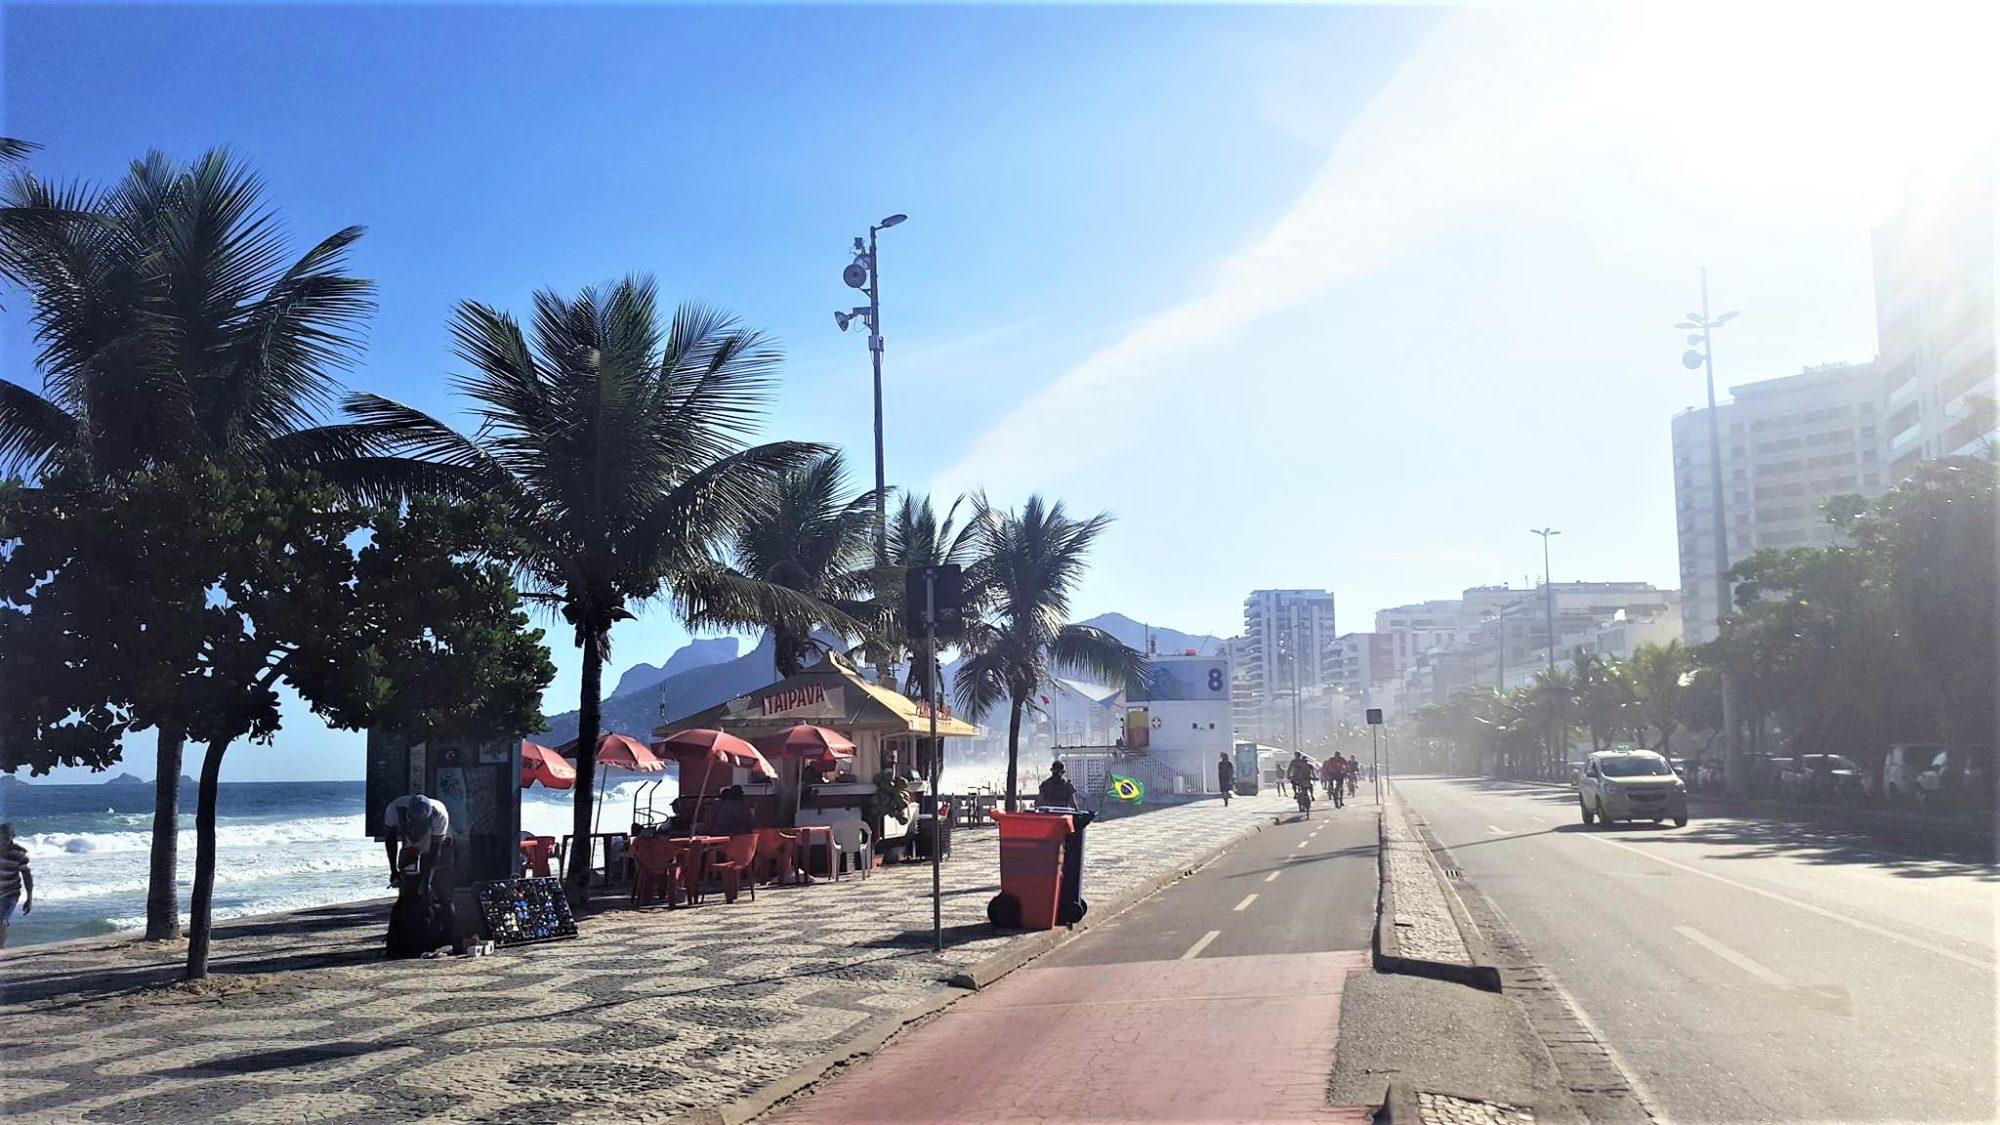 Rio de Janeiro Ipanema blog voyage clioandco brésil